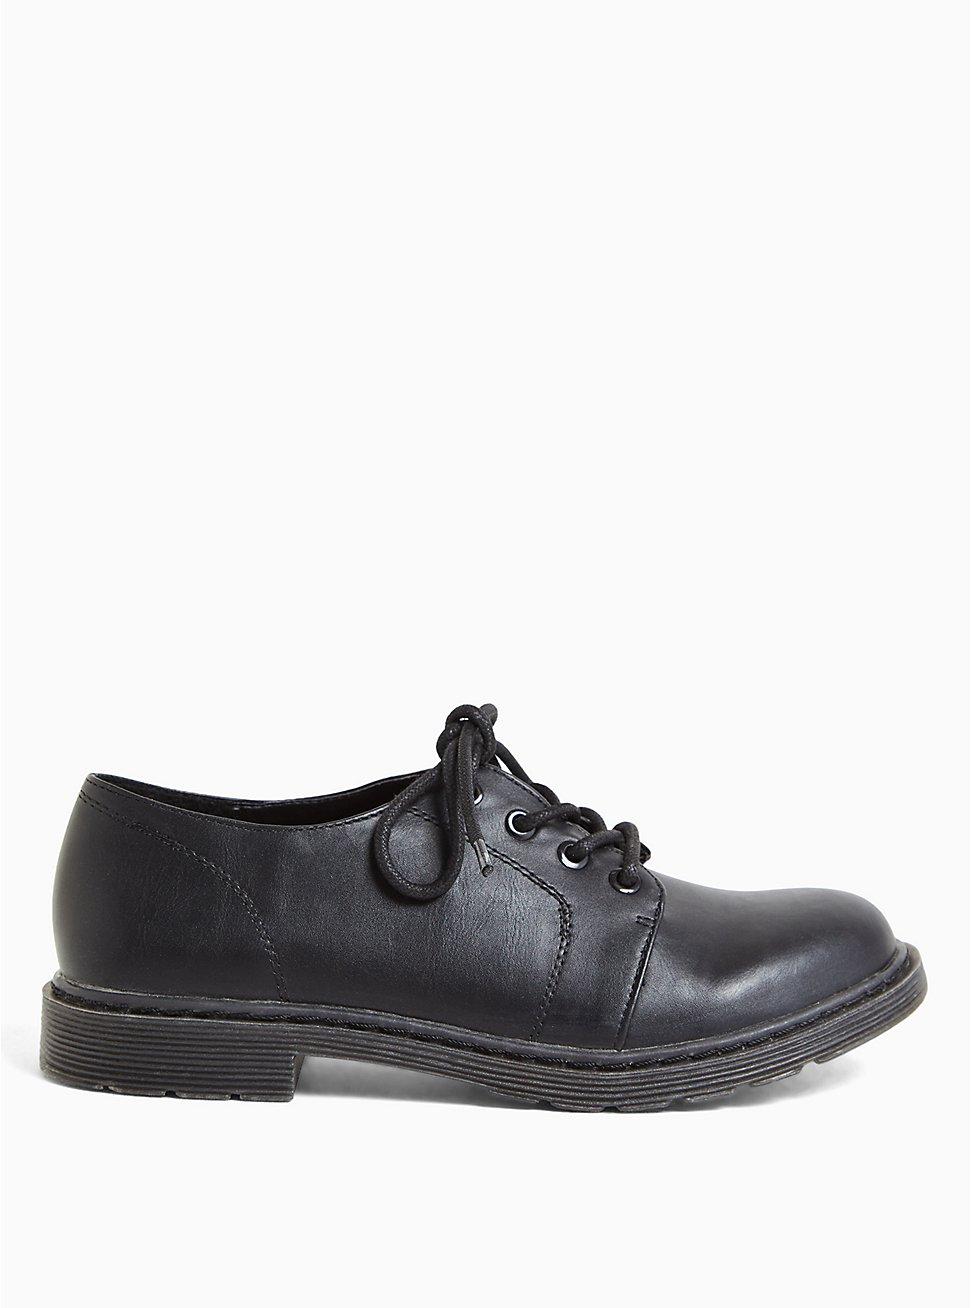 Black Faux Leather Lace-Up Oxford Flat (WW), BLACK, hi-res